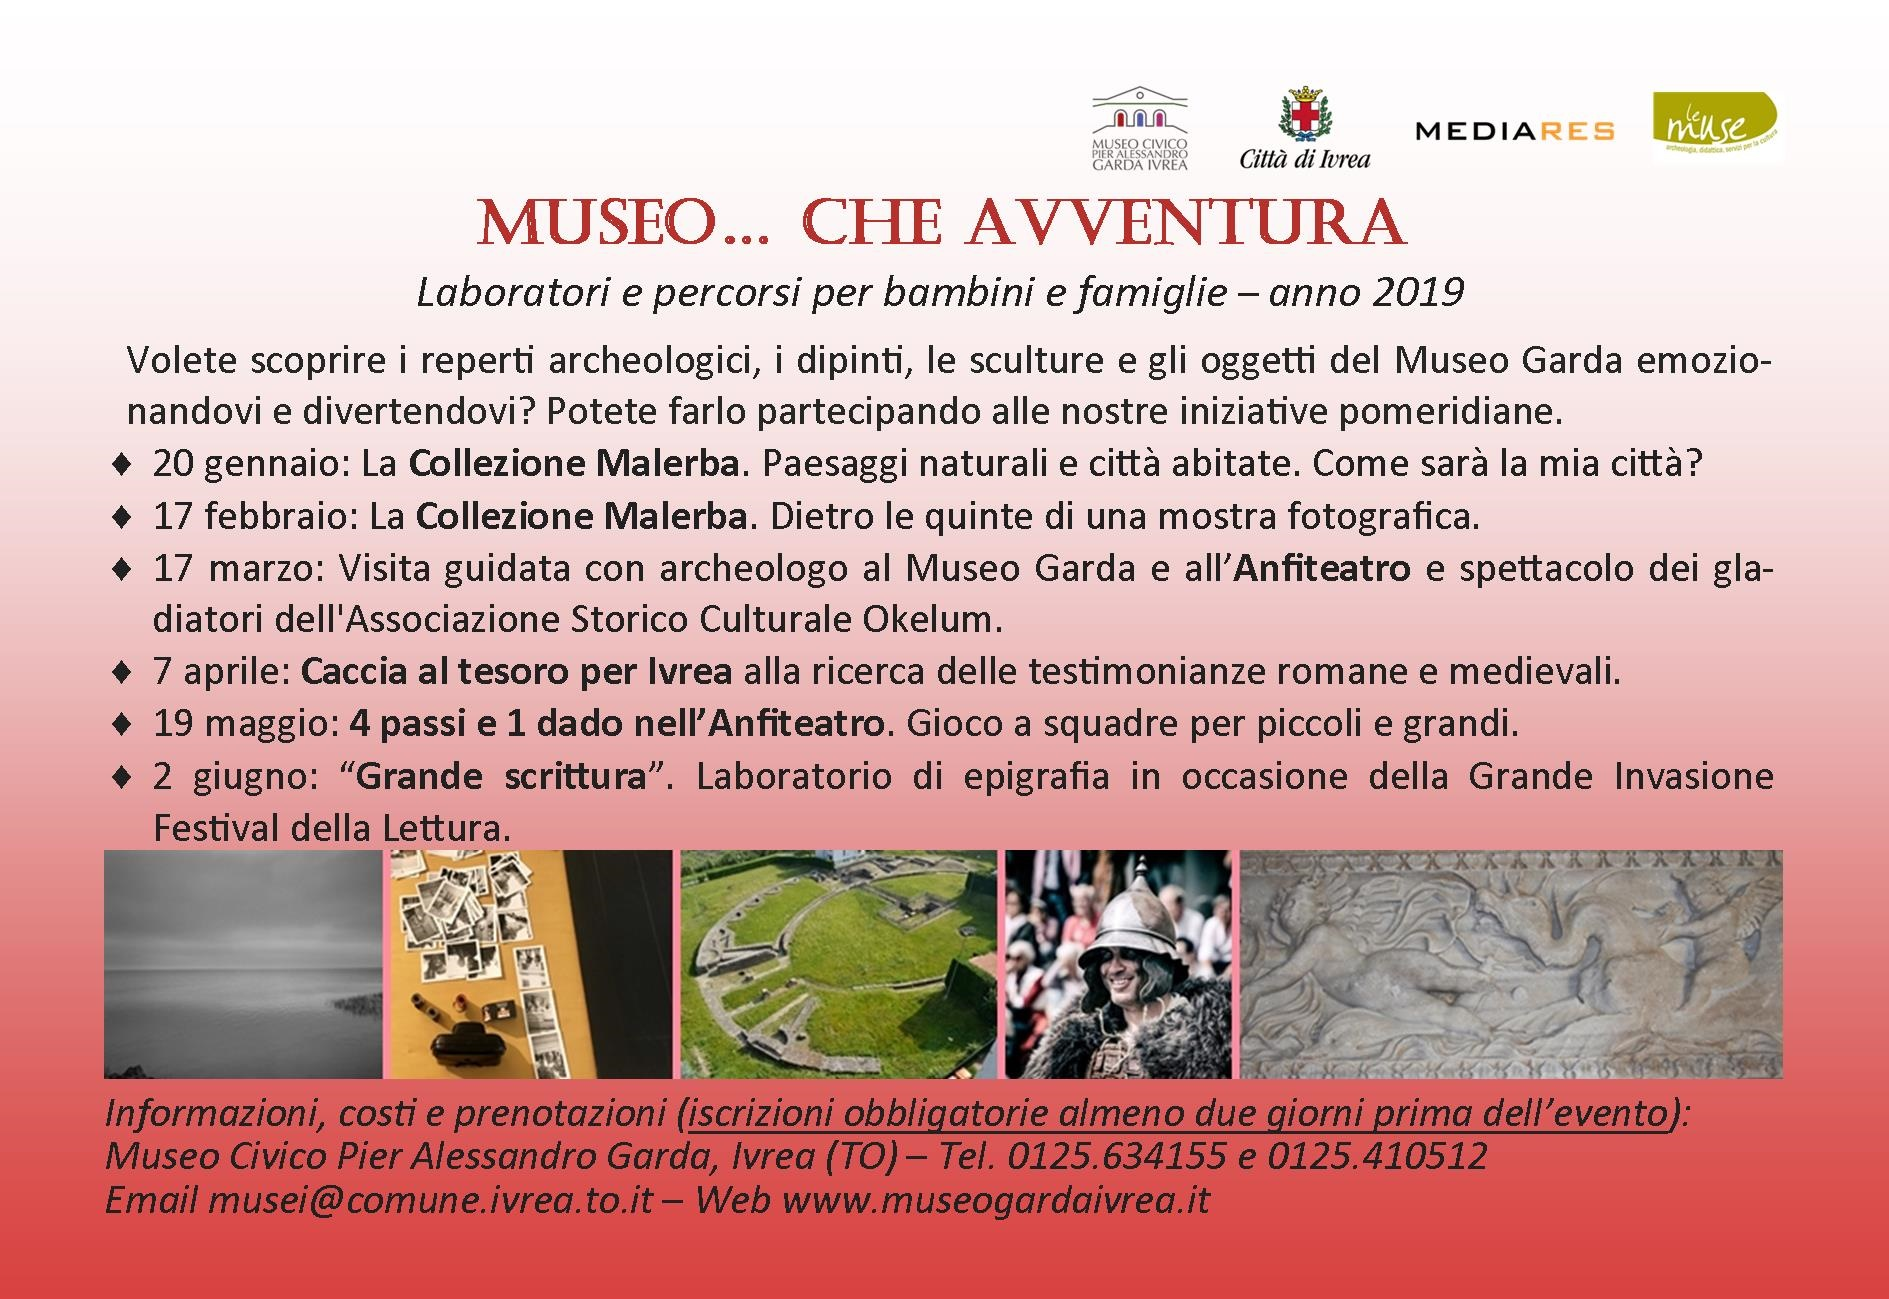 Ivrea_cartolina_eventi_museo_garda(1)